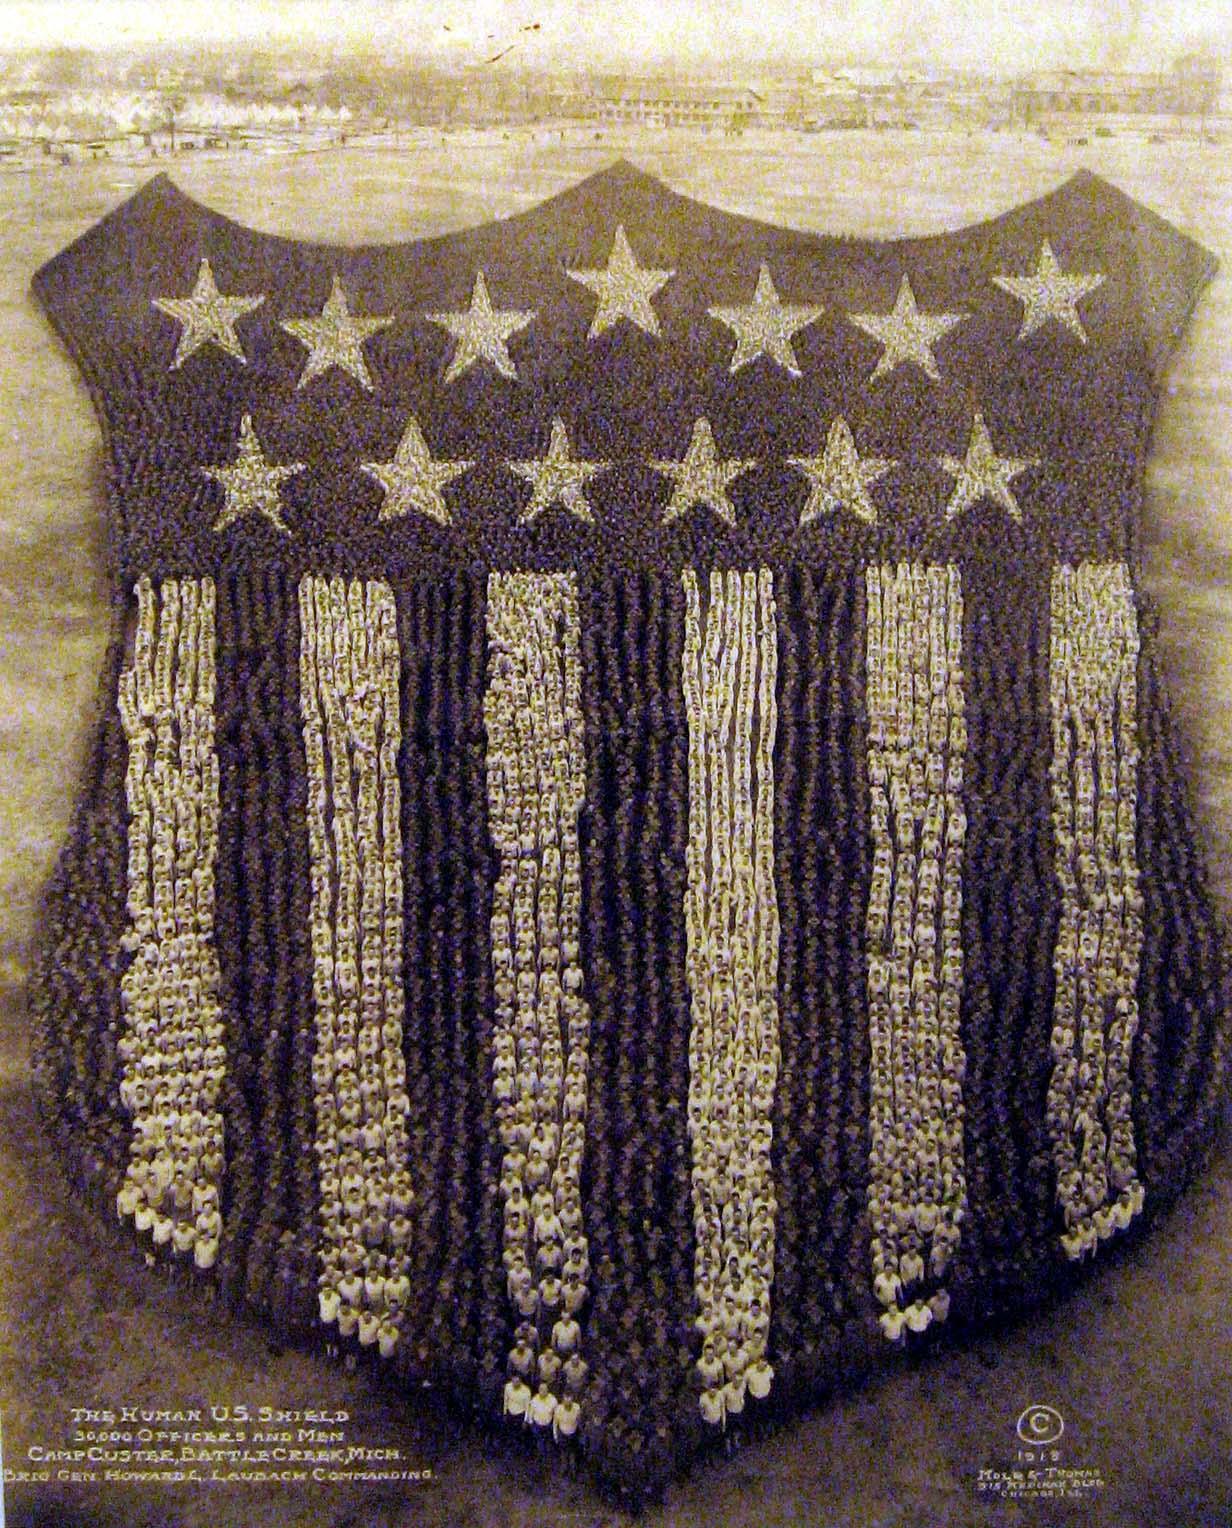 Vintage-Photos-Mole-Thomas-1918-Human-US-Shield-1